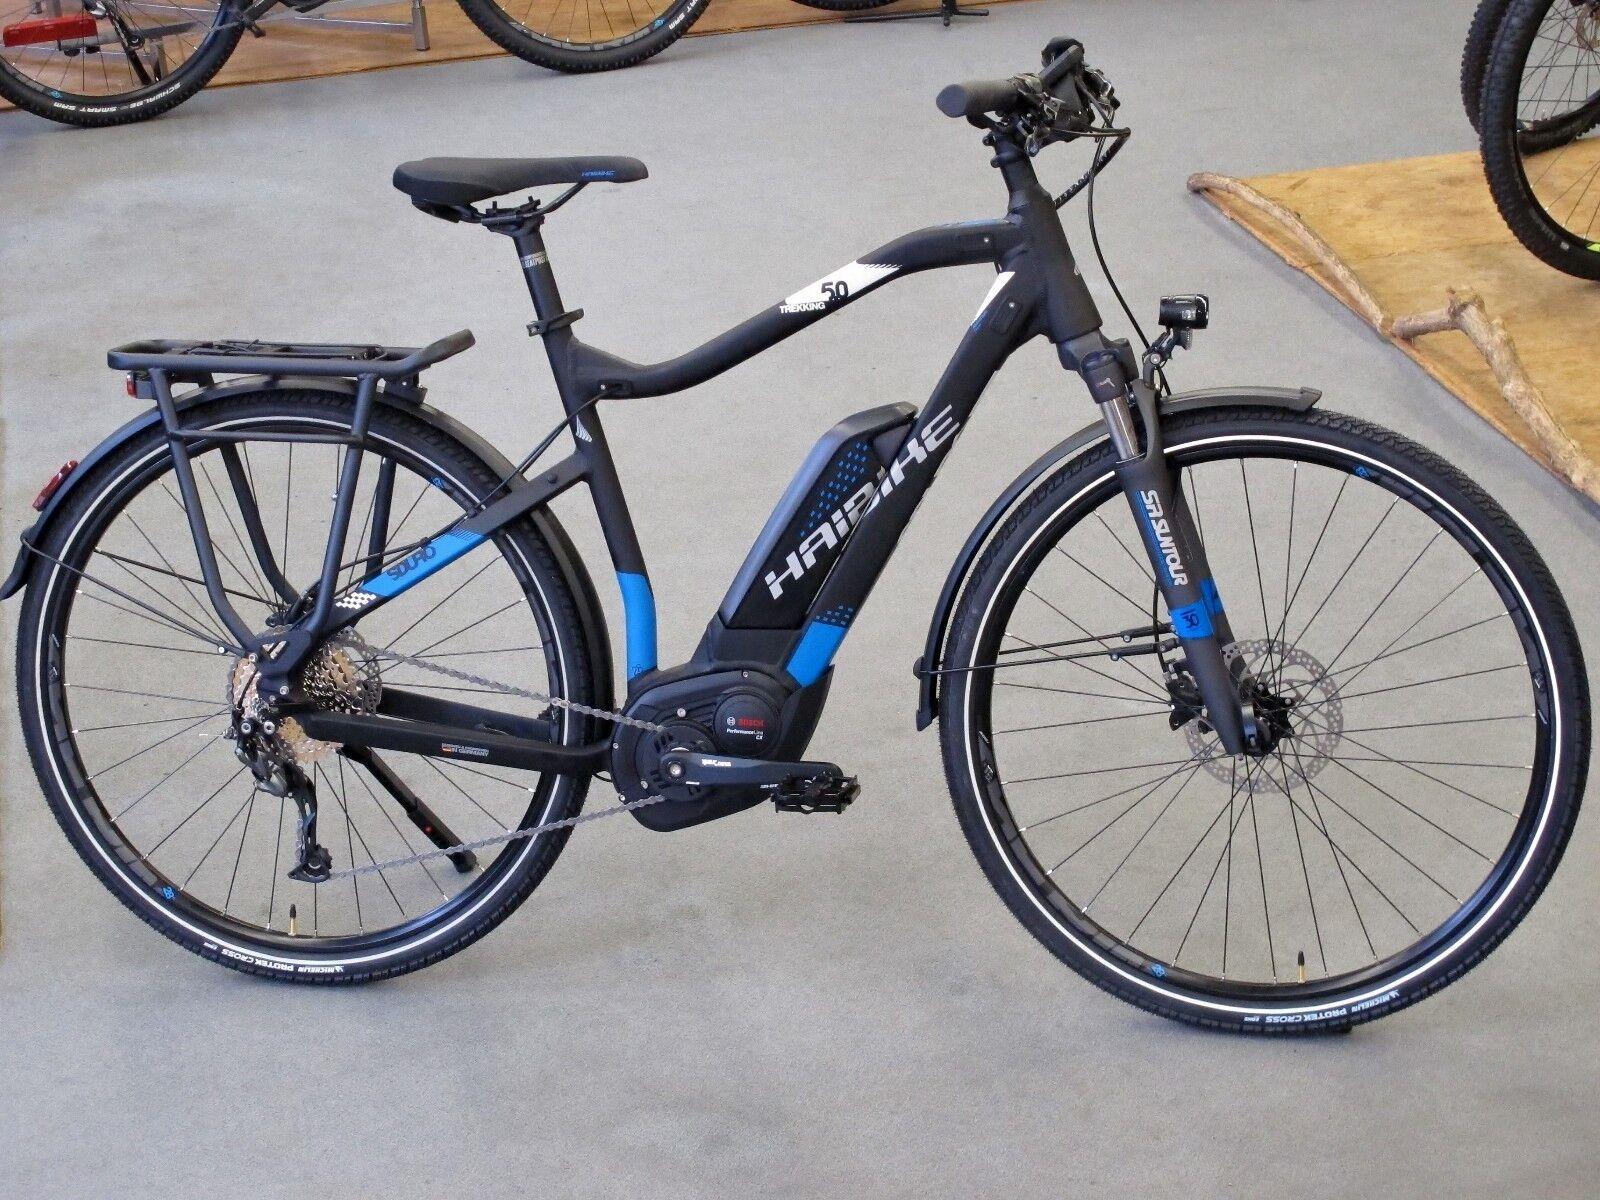 0ea3990704394e E Bike Rh 60 Test Vergleich +++ E Bike Rh 60 kaufen   sparen!